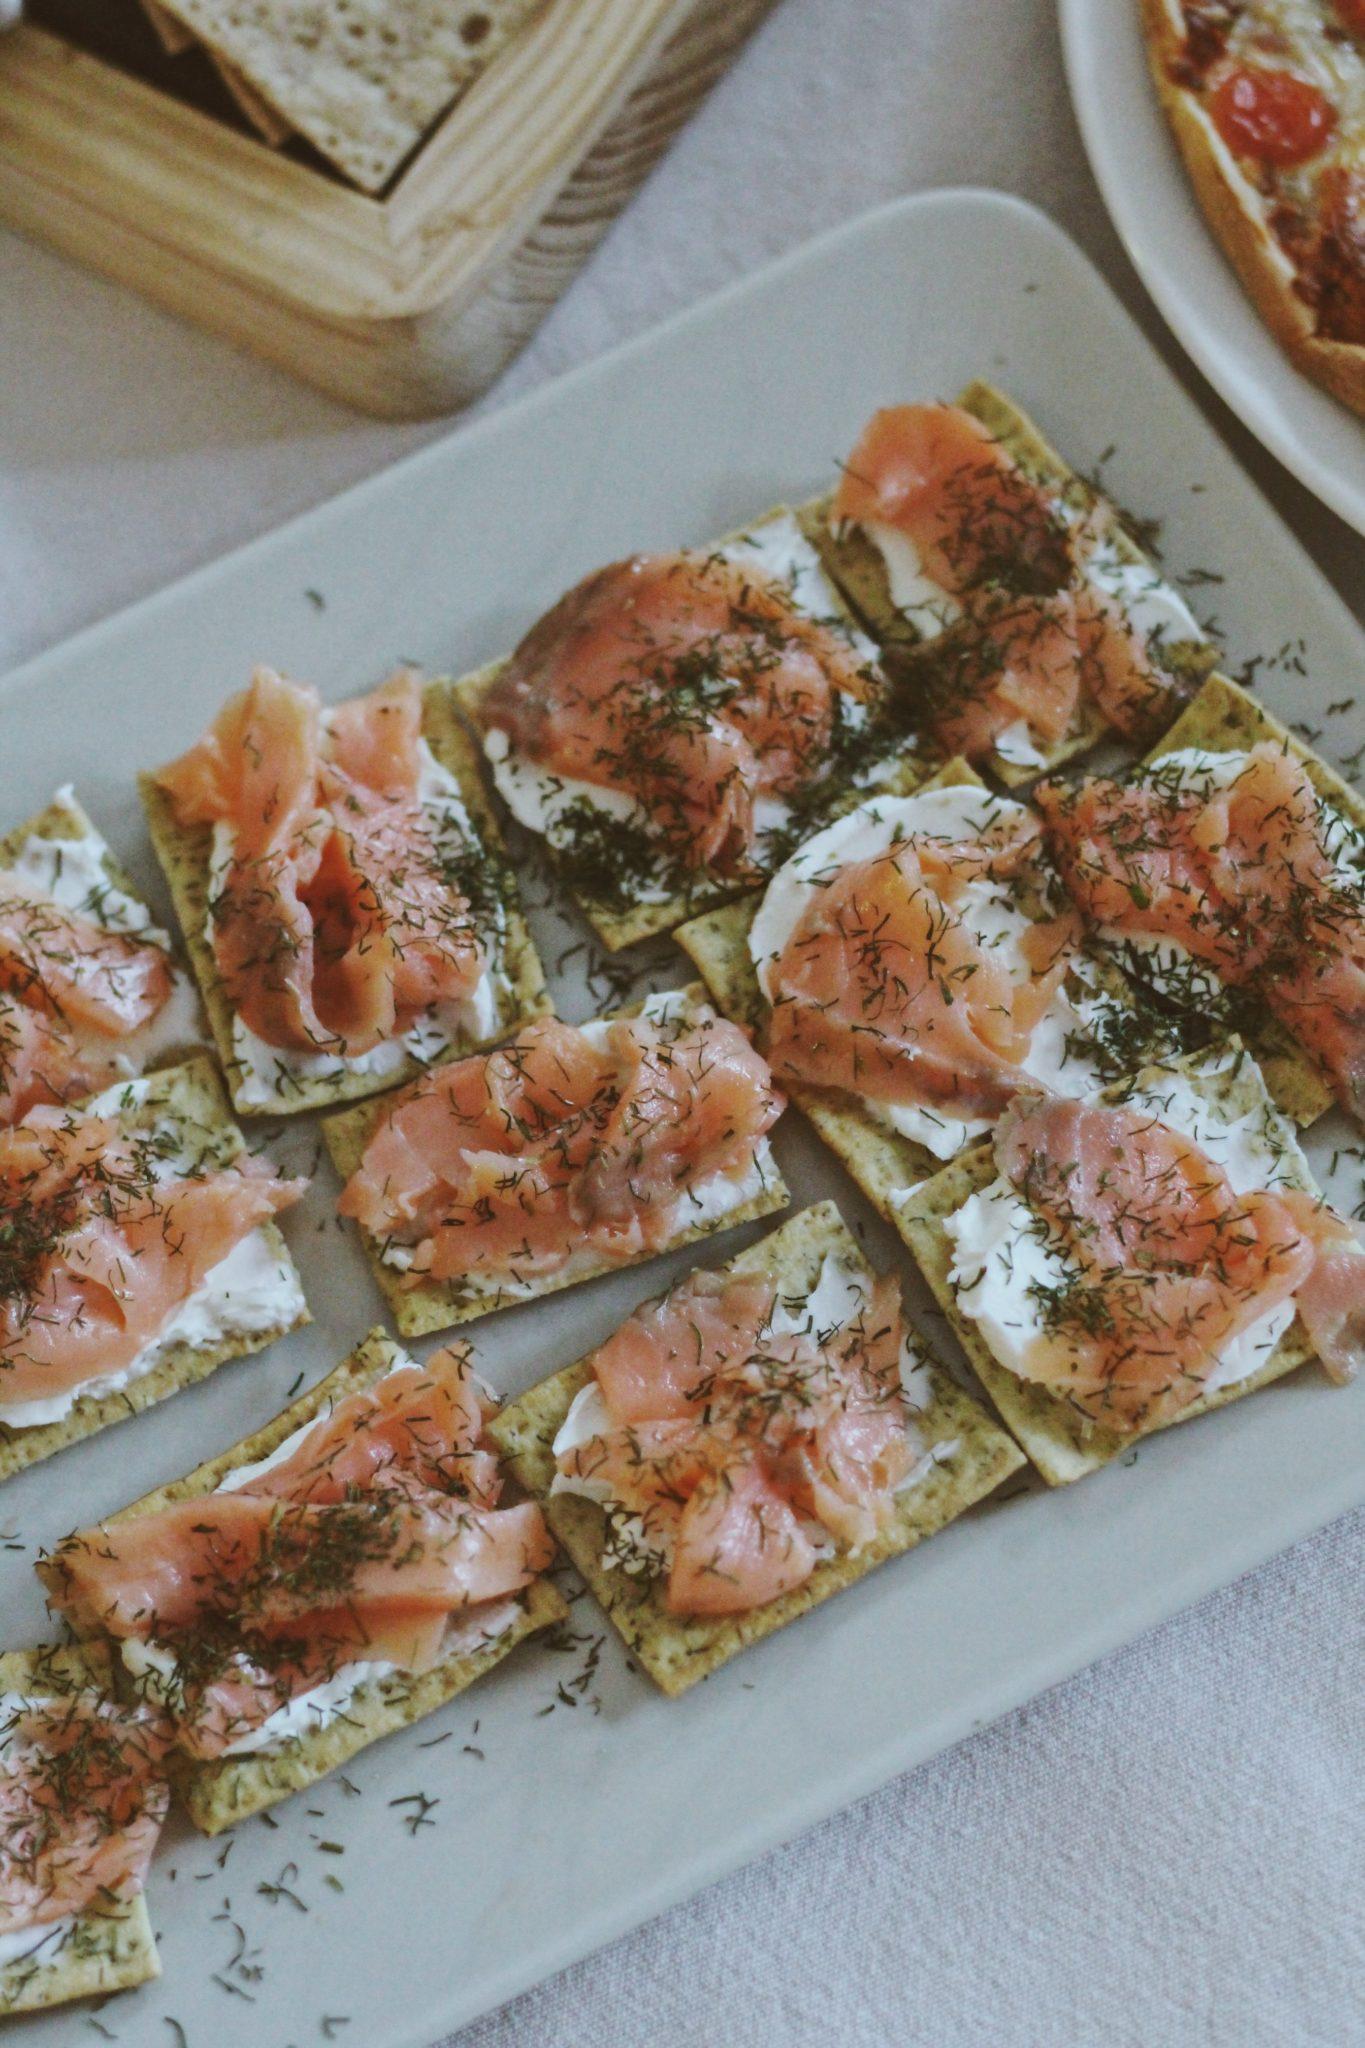 receta facil salmon marinado crackers Paul and pippa